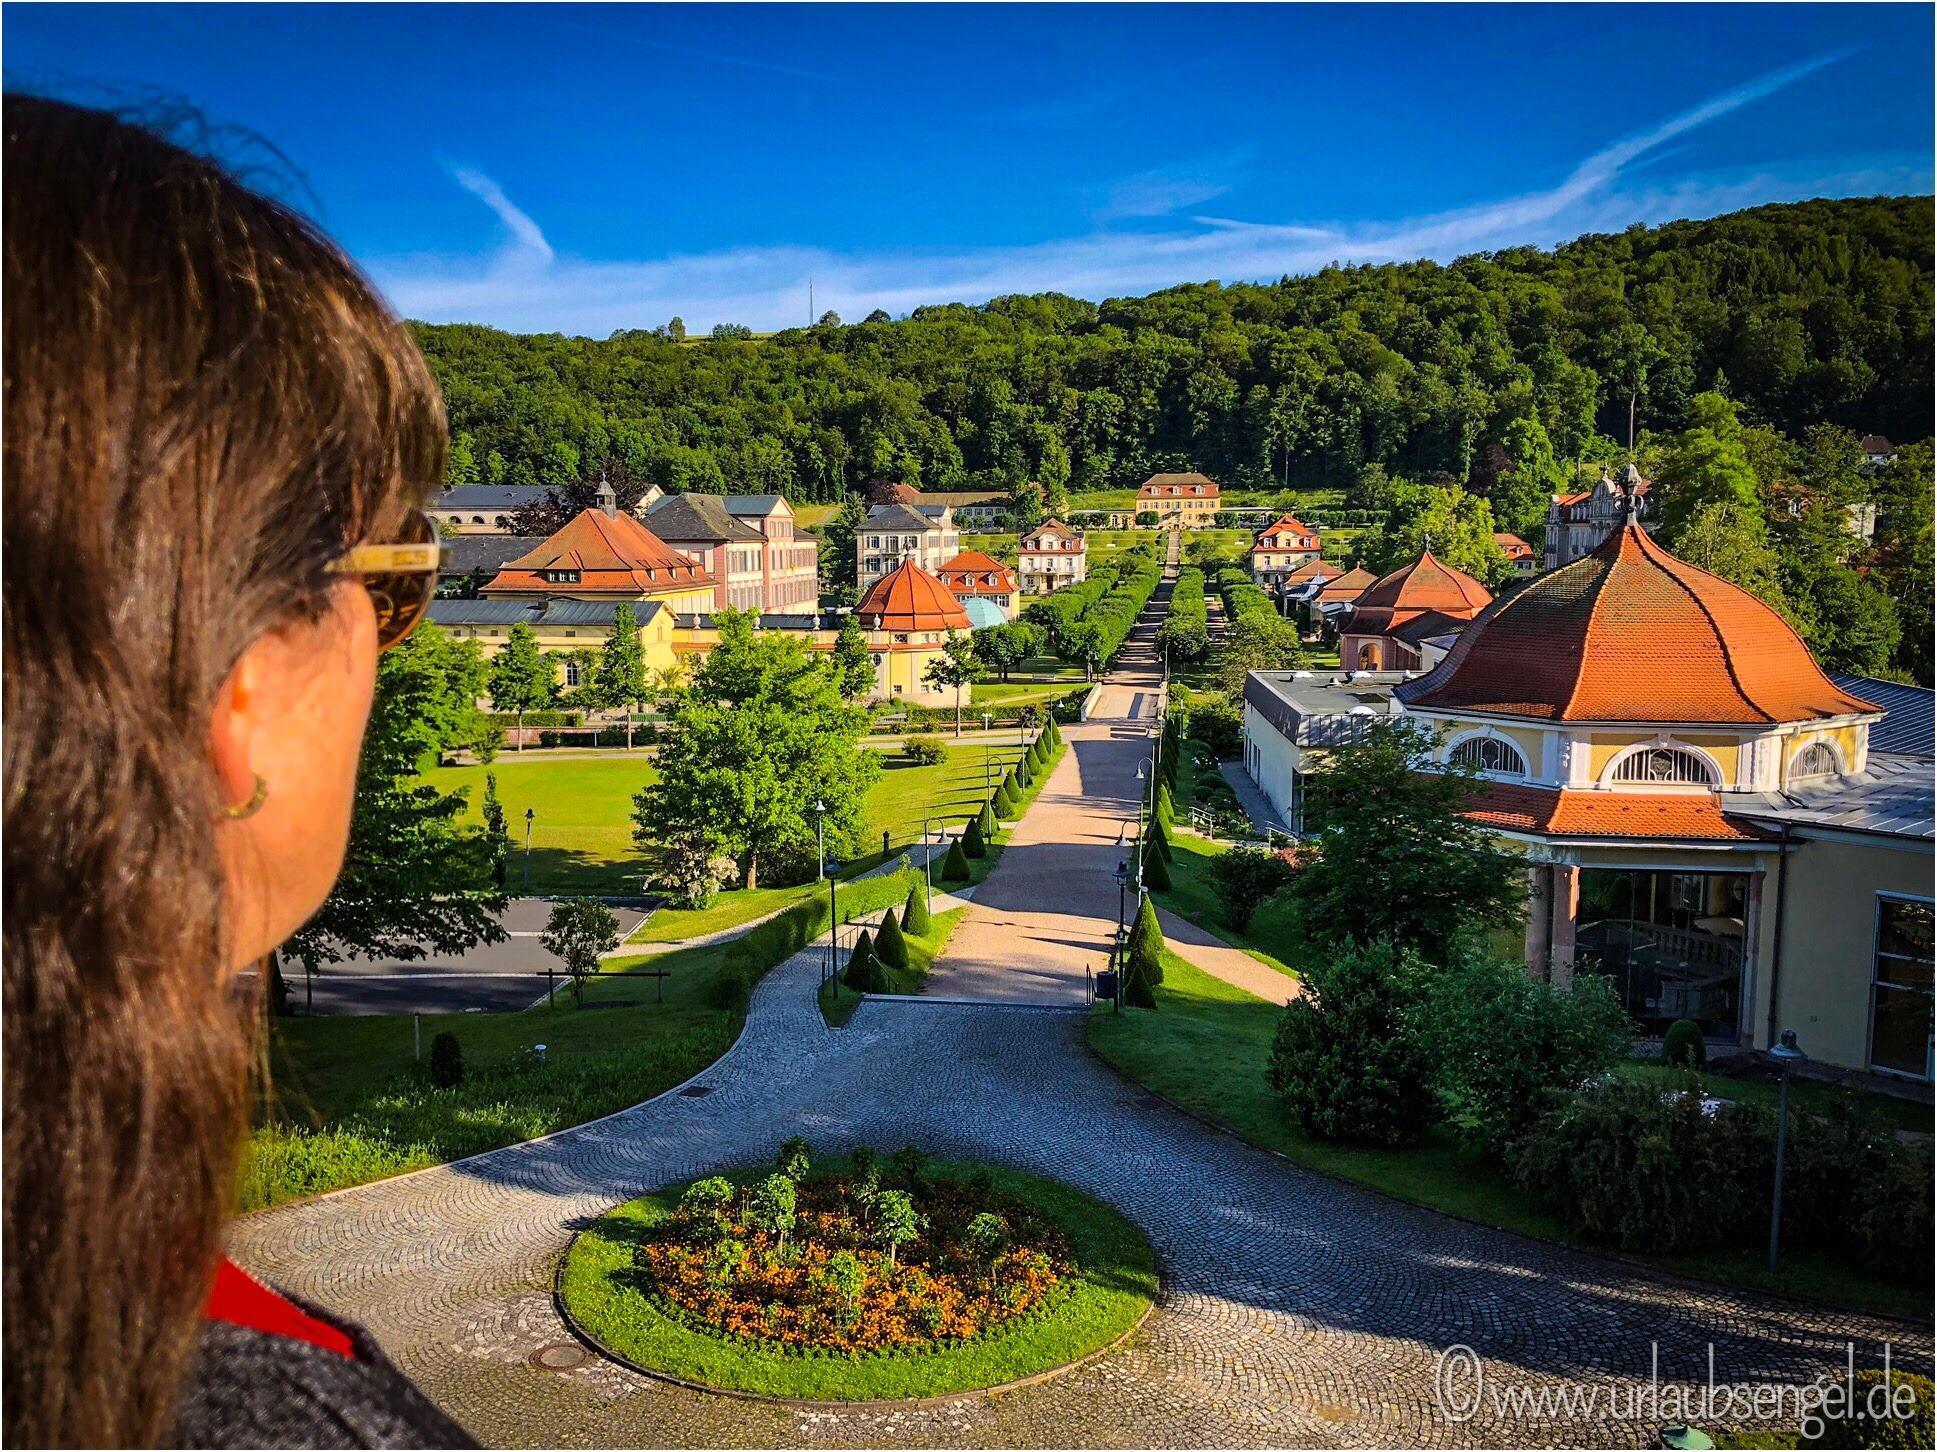 Wellness Wochenende im Dorint Bad Brückenau